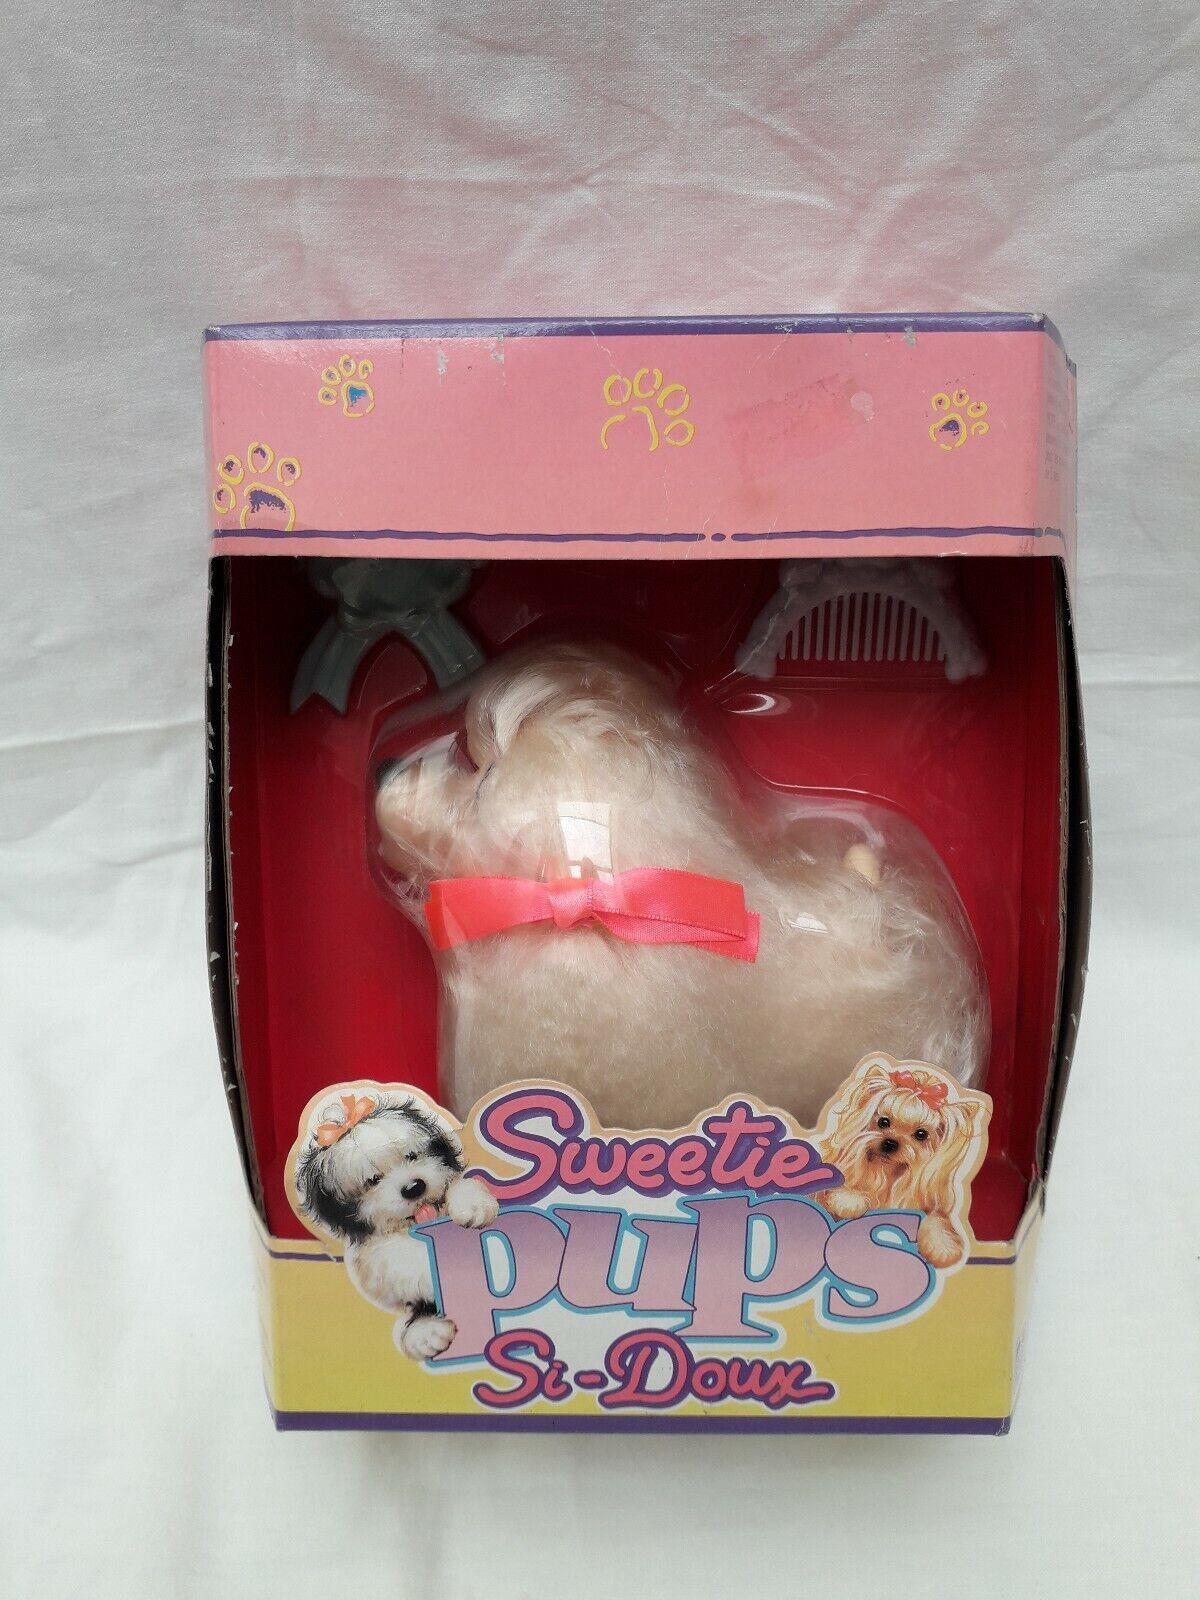 Sweetie Pups Si-Doux Hasbro Vintage 1989 neuf Boite no bébé baby  3